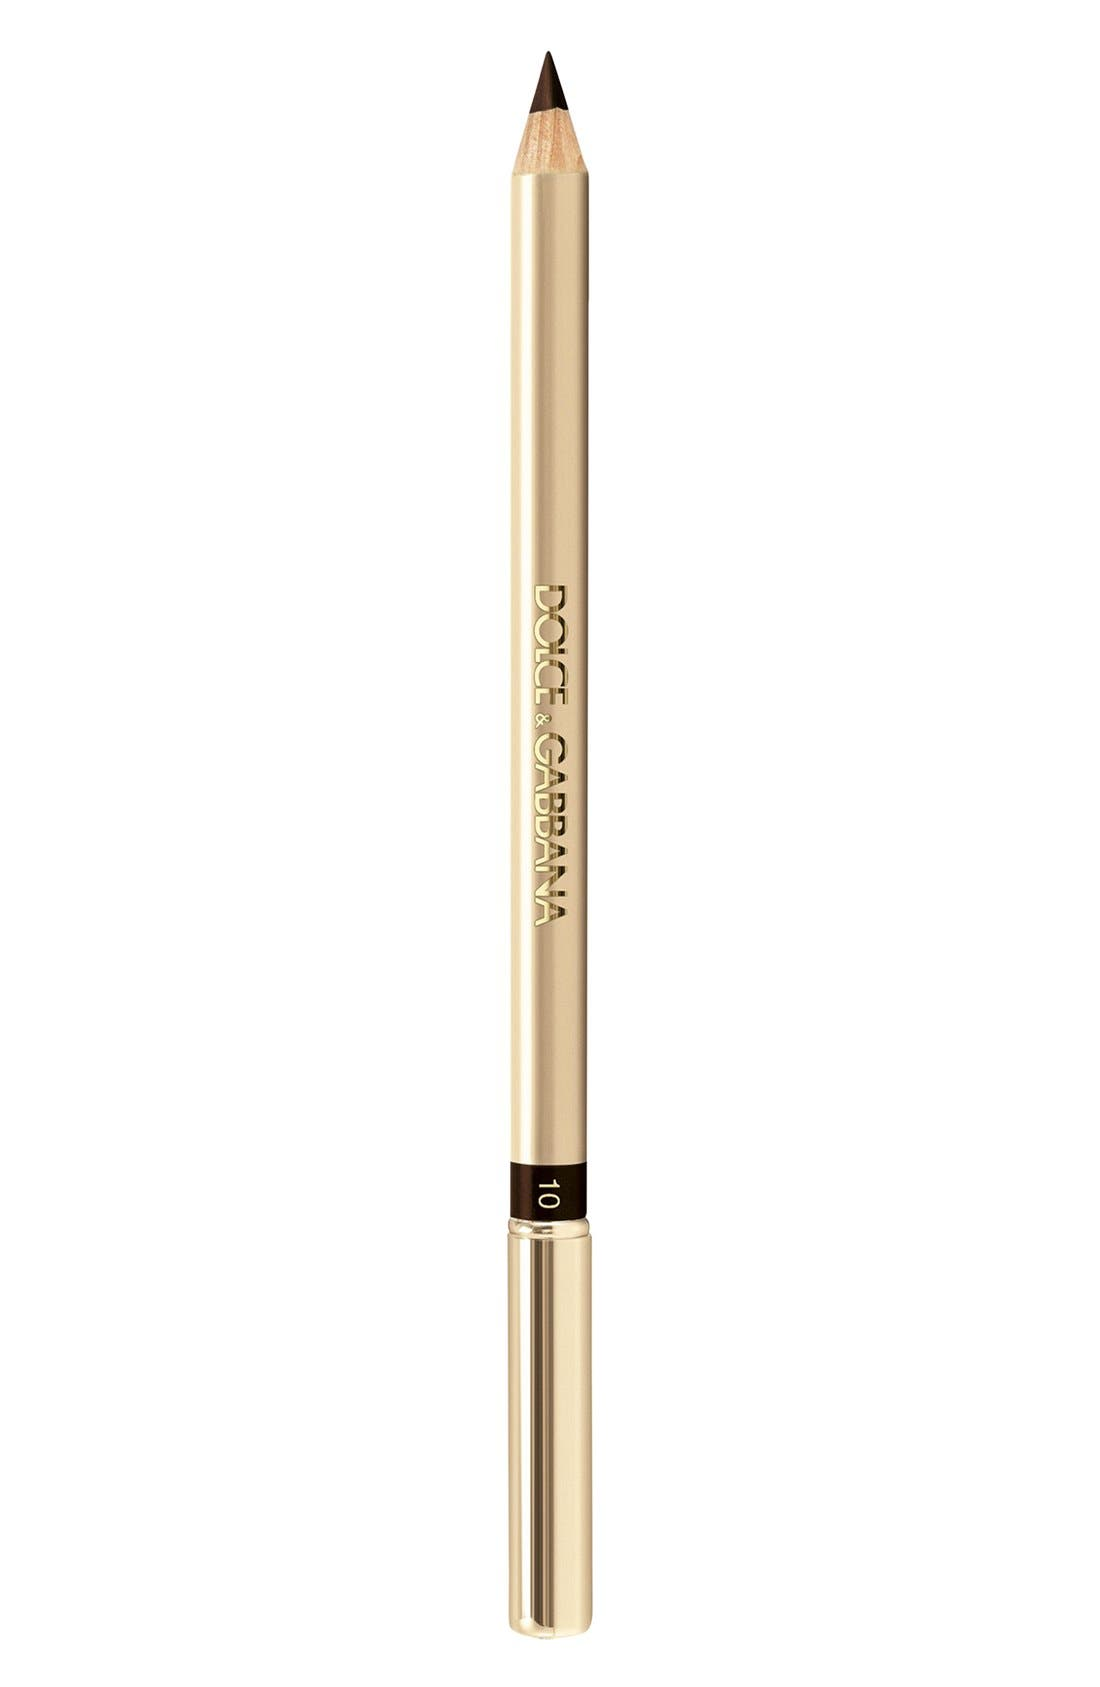 Dolce&Gabbana Beauty Crayon Intense Eyeliner